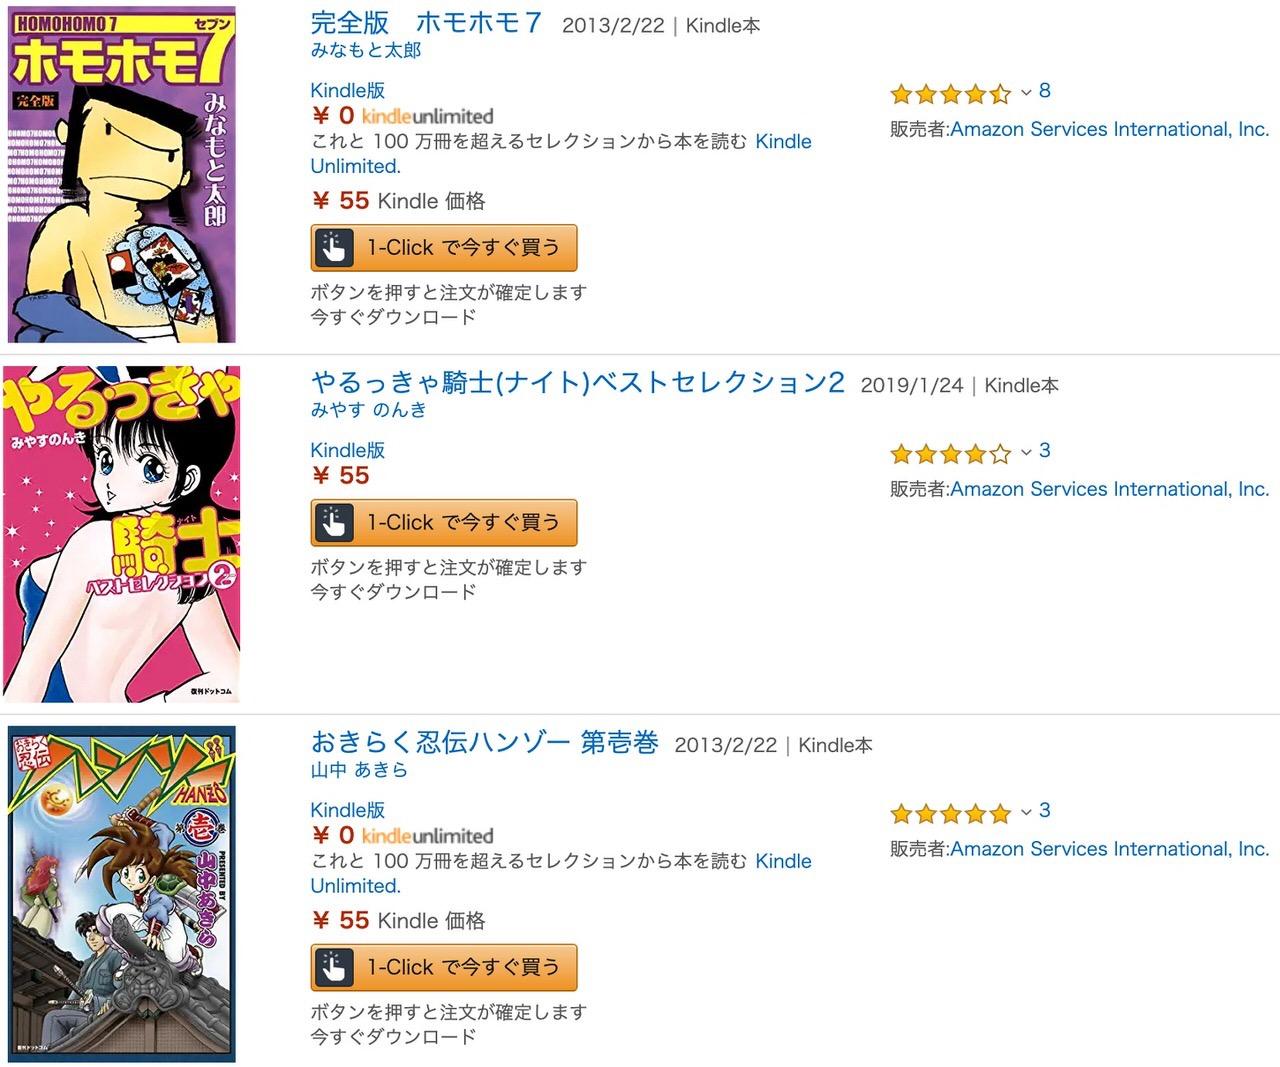 【Kindleセール】やるっきゃ騎士(ナイト)、ローンナイトなどが1冊55円「最終巻まで一気読み 復刊漫画フェア」(9/19まで)